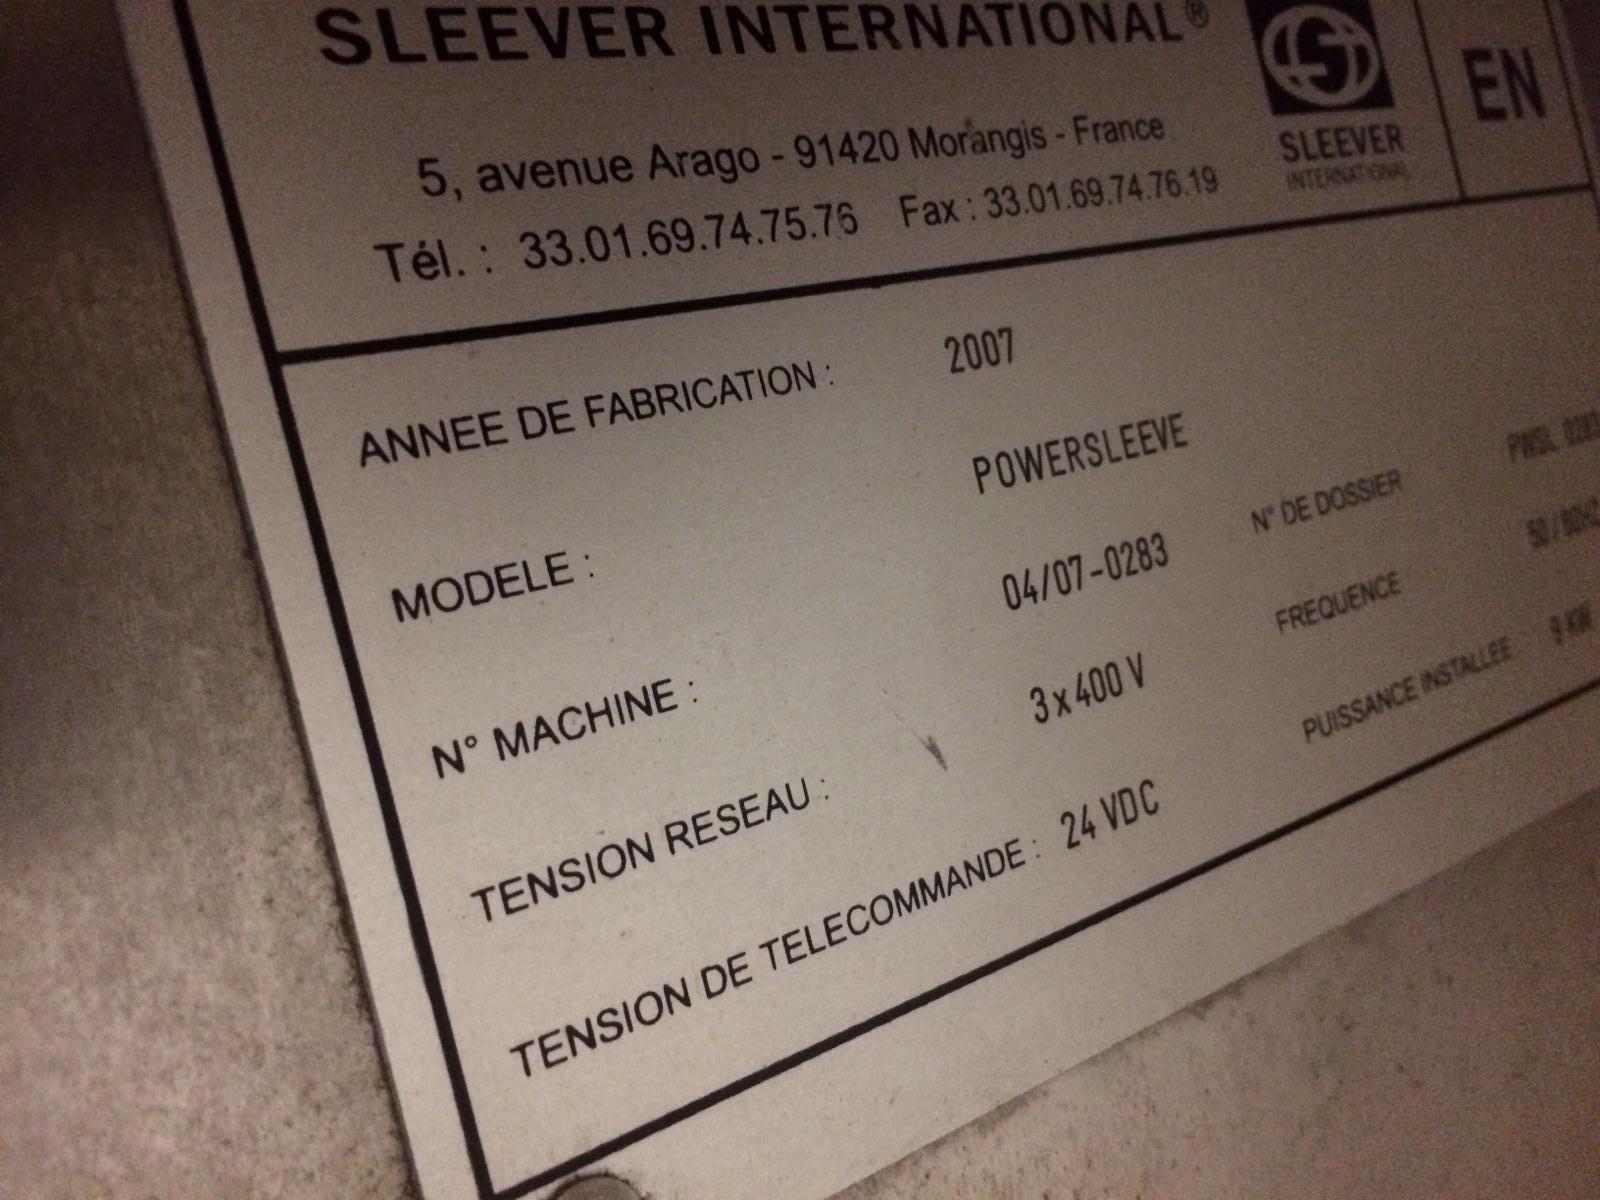 Lot 71 - Slever International , Powersleeve, Model :04/07-0283, MFG 2007 :equipment located at Clark Logistic